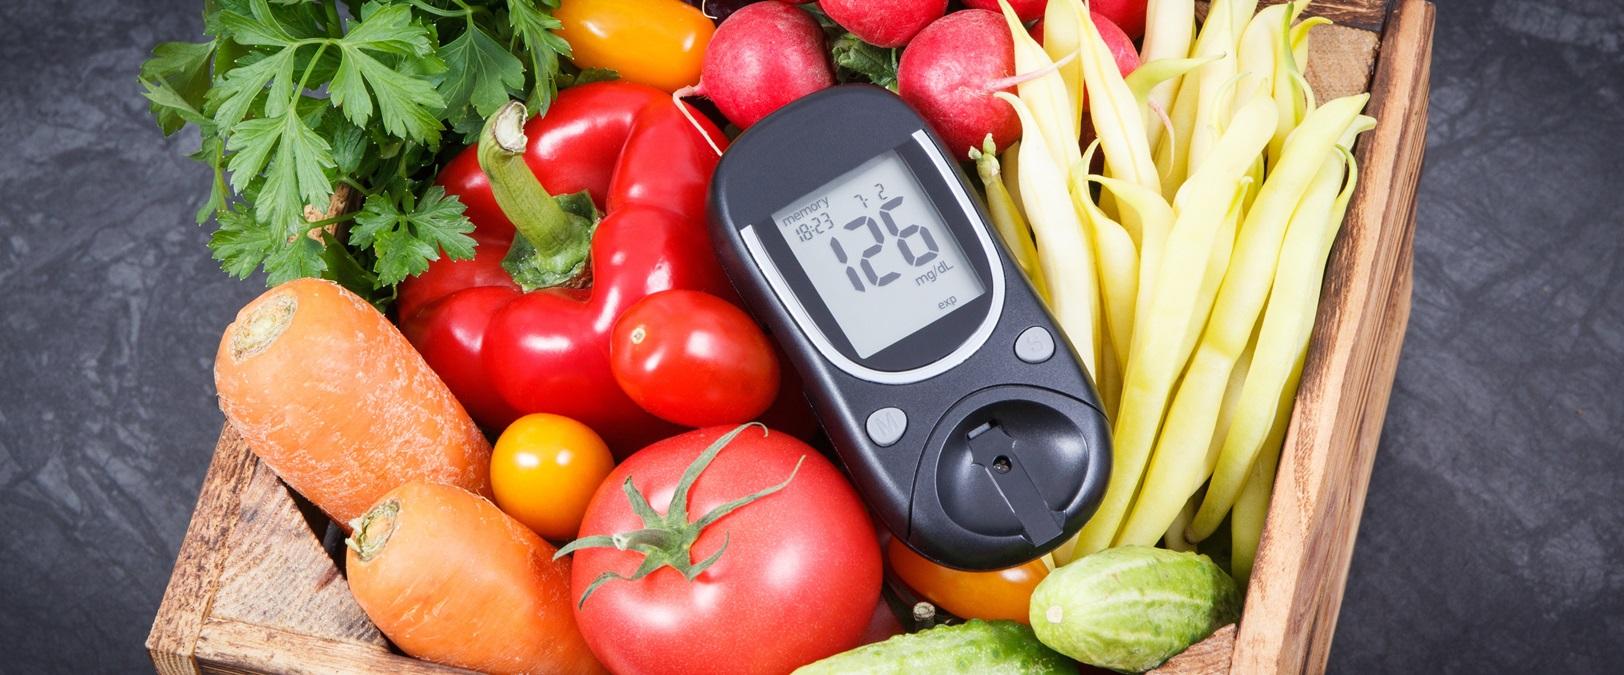 dieta vegana cura la diabetes tipo 1